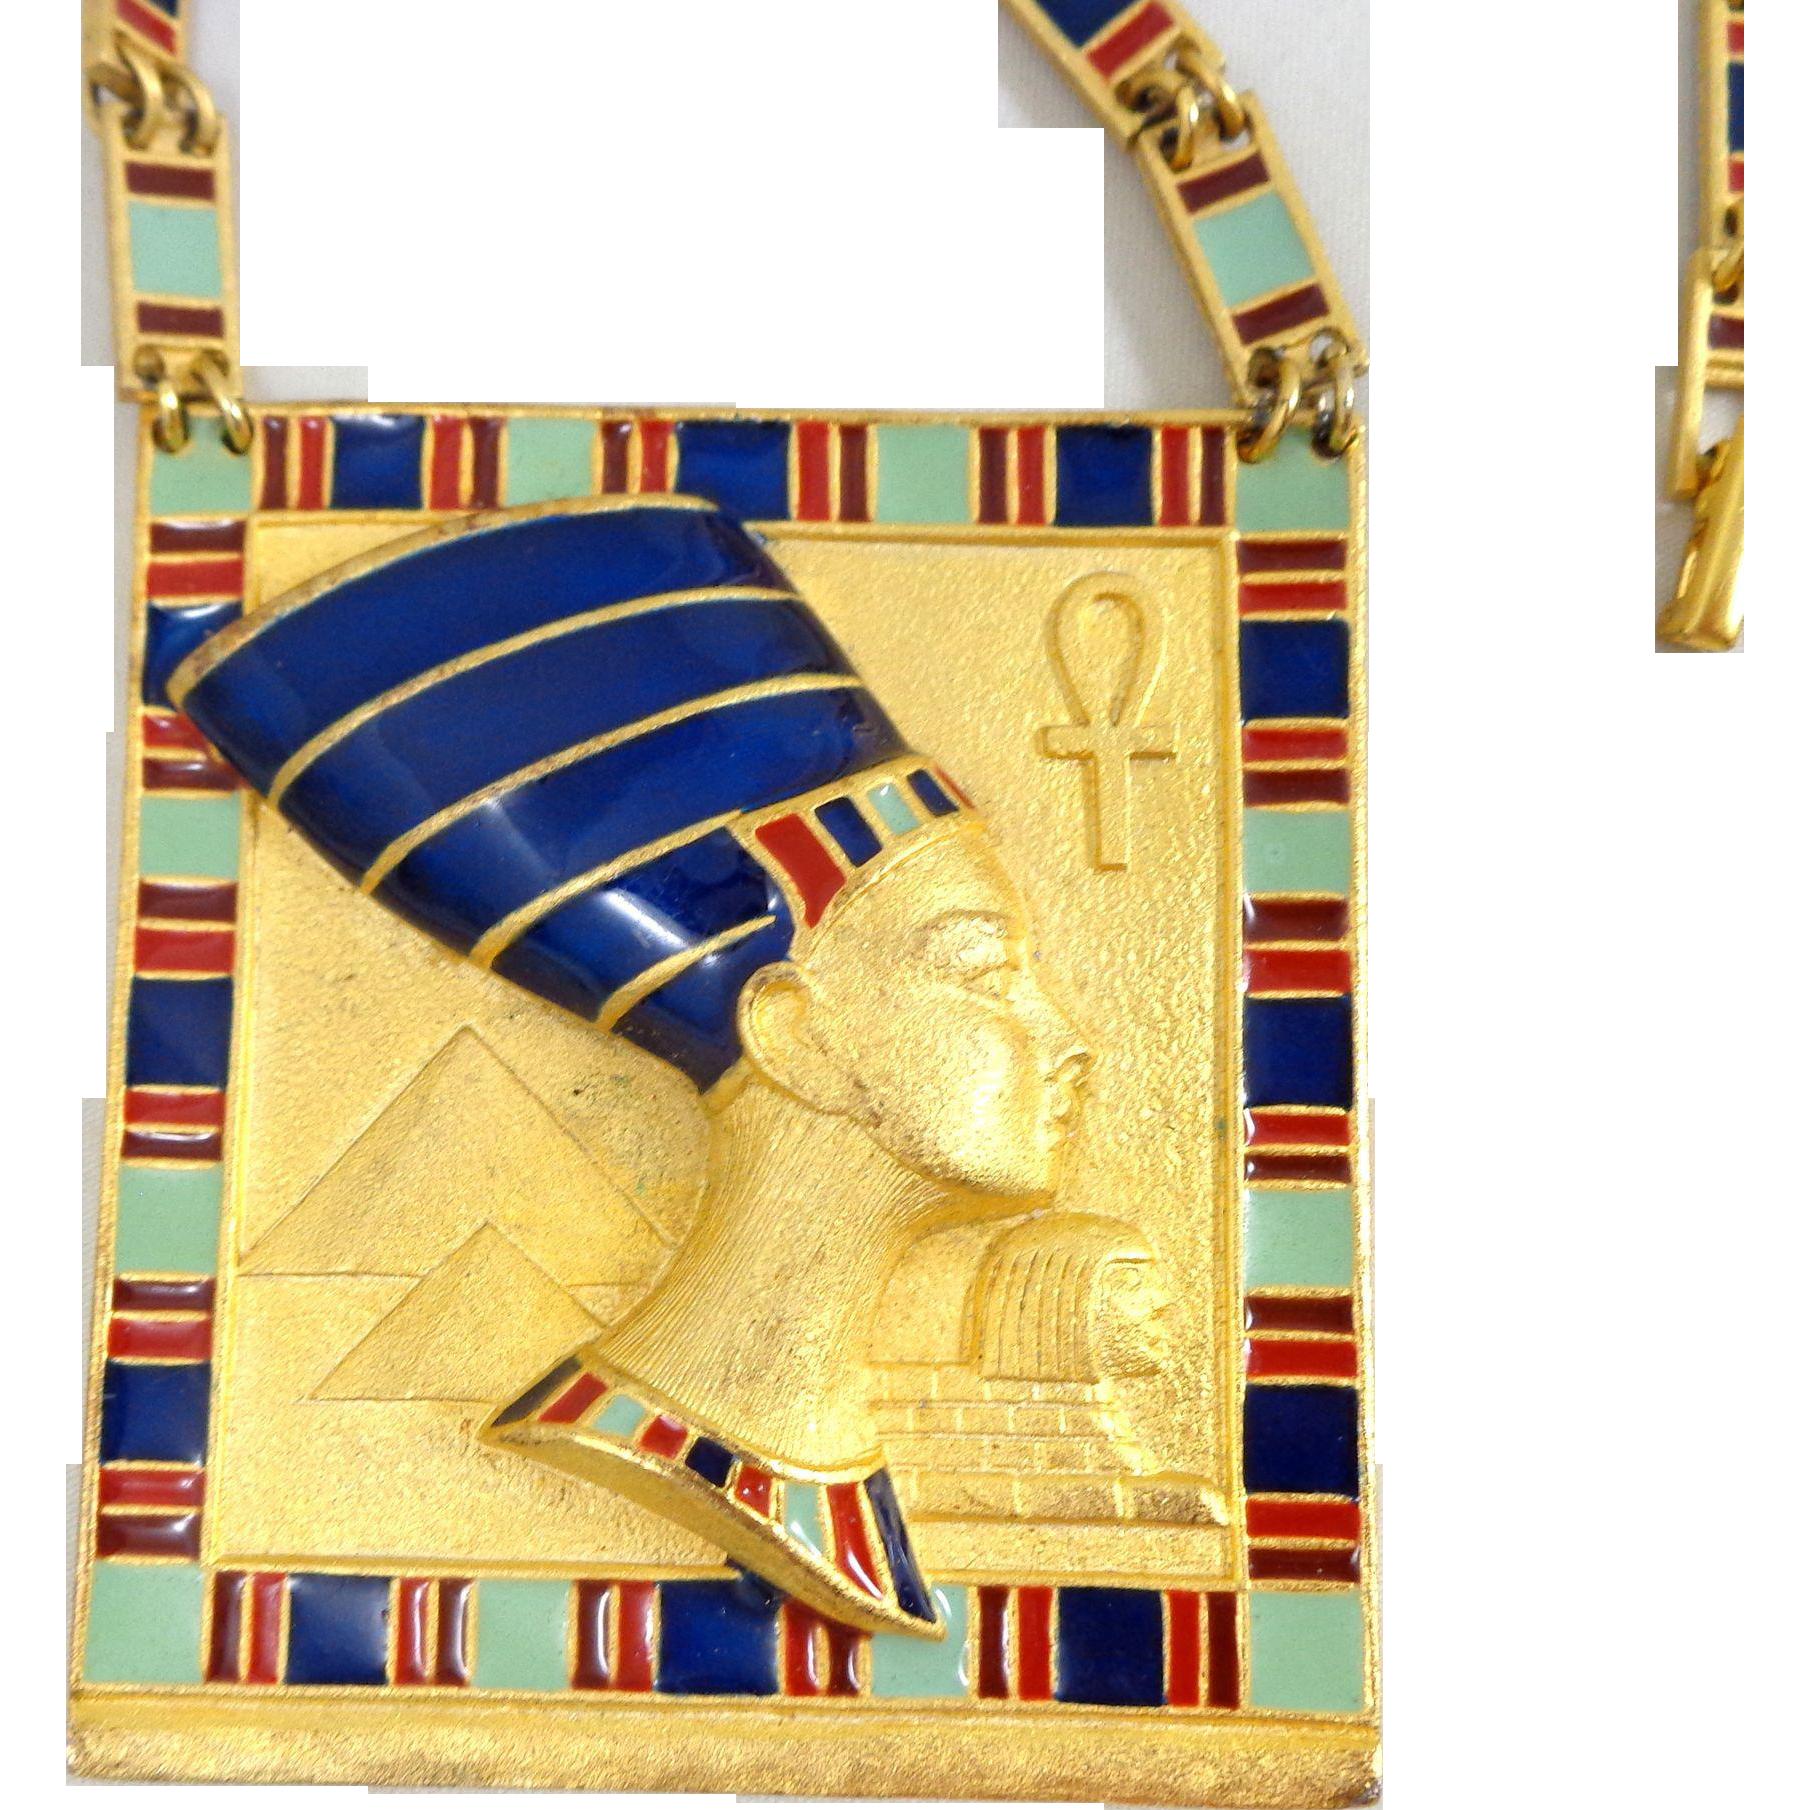 Vintage Egyptian Revival Nefertiti Enamel Link Necklace